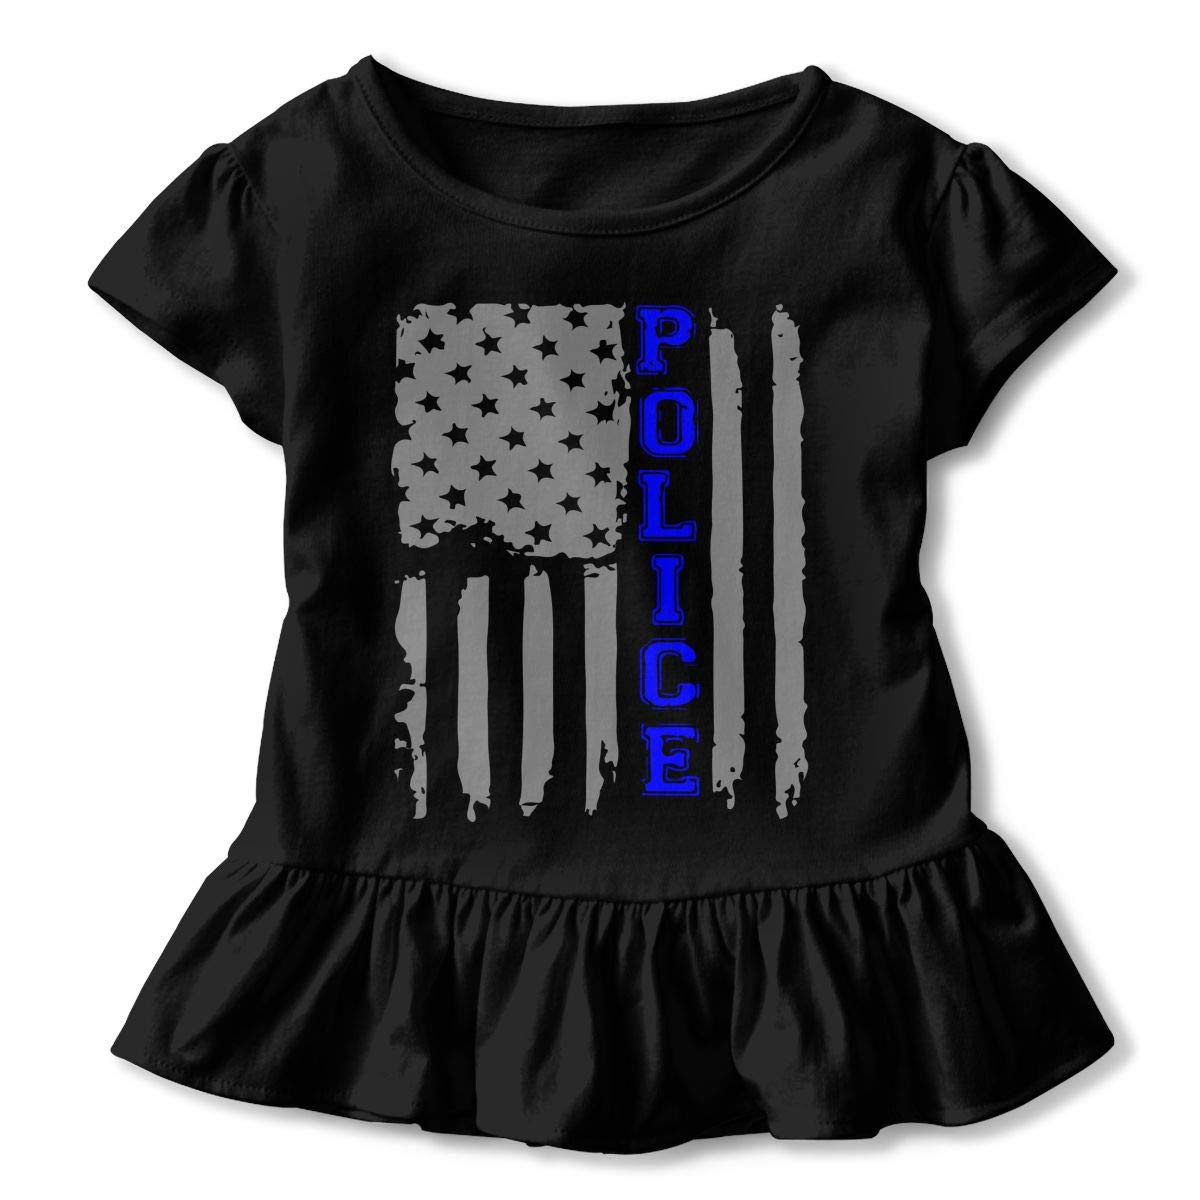 SHIRT1-KIDS Police Flag T Shirts Childrens Girls Short Sleeve Ruffles Shirt T-Shirt for 2-6T